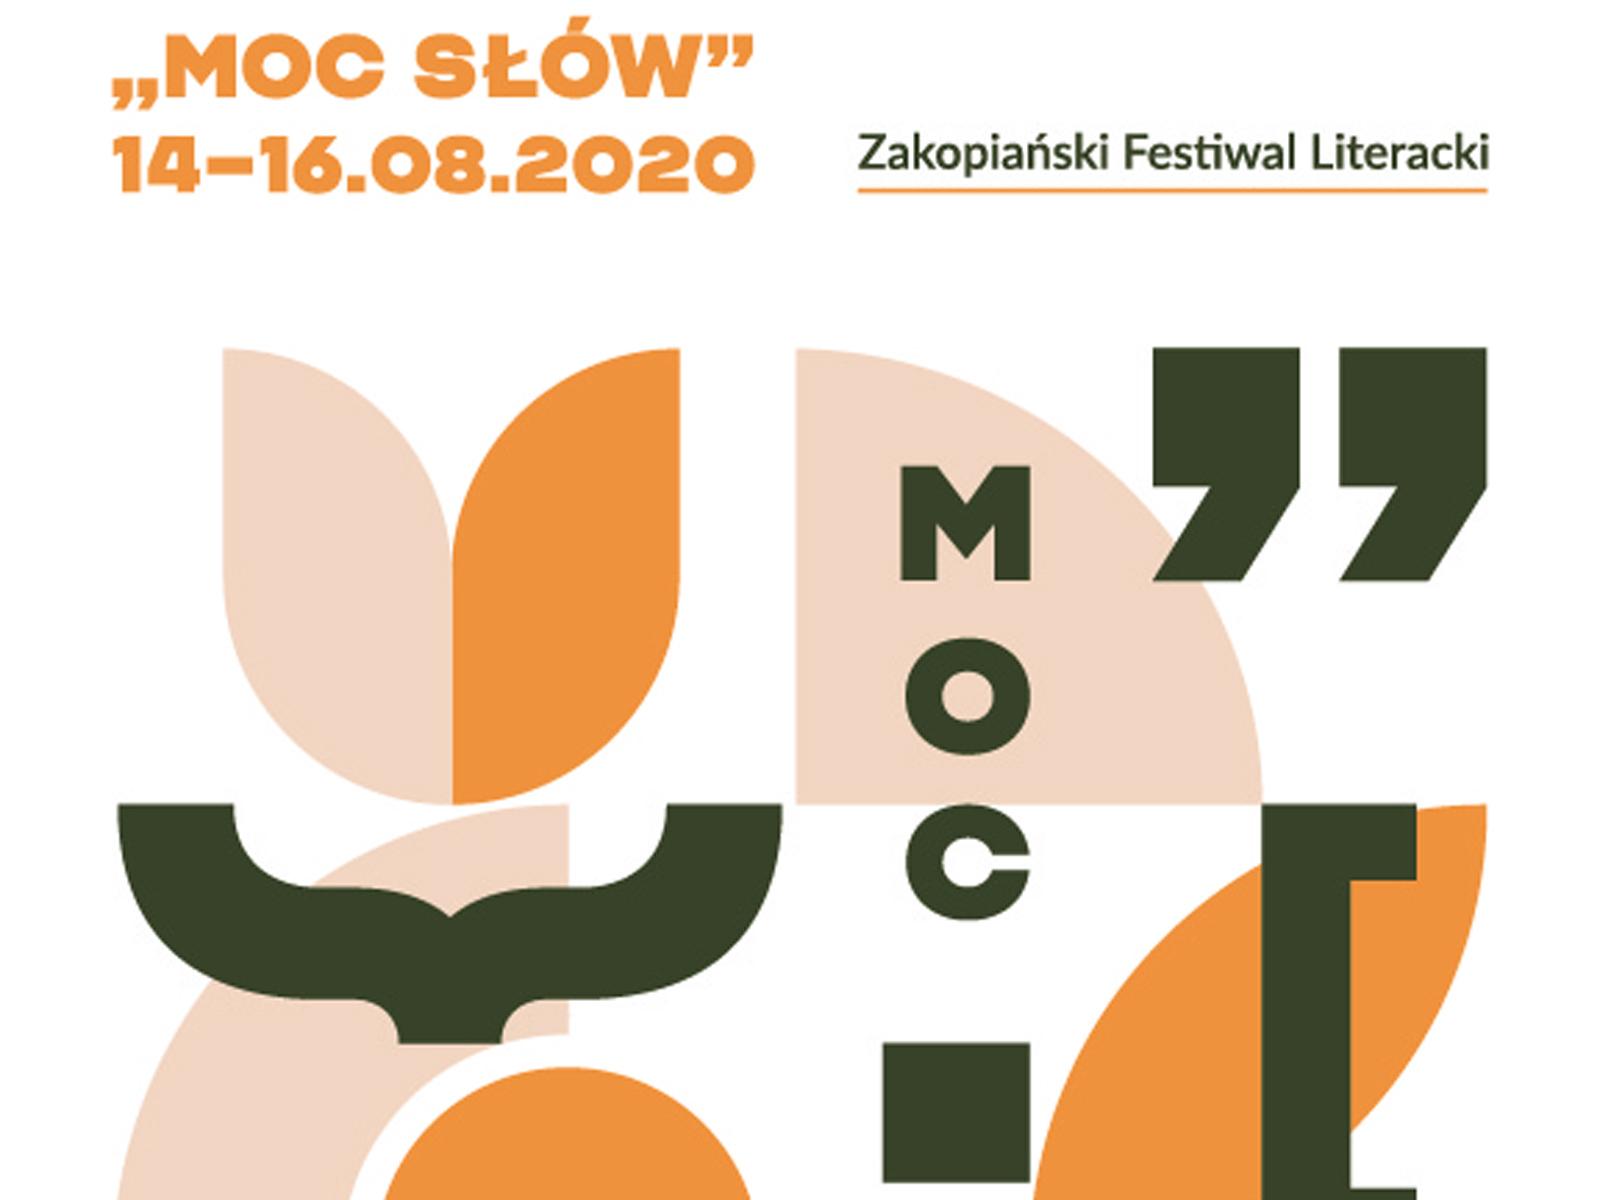 zakopiański-festiwal-literacki